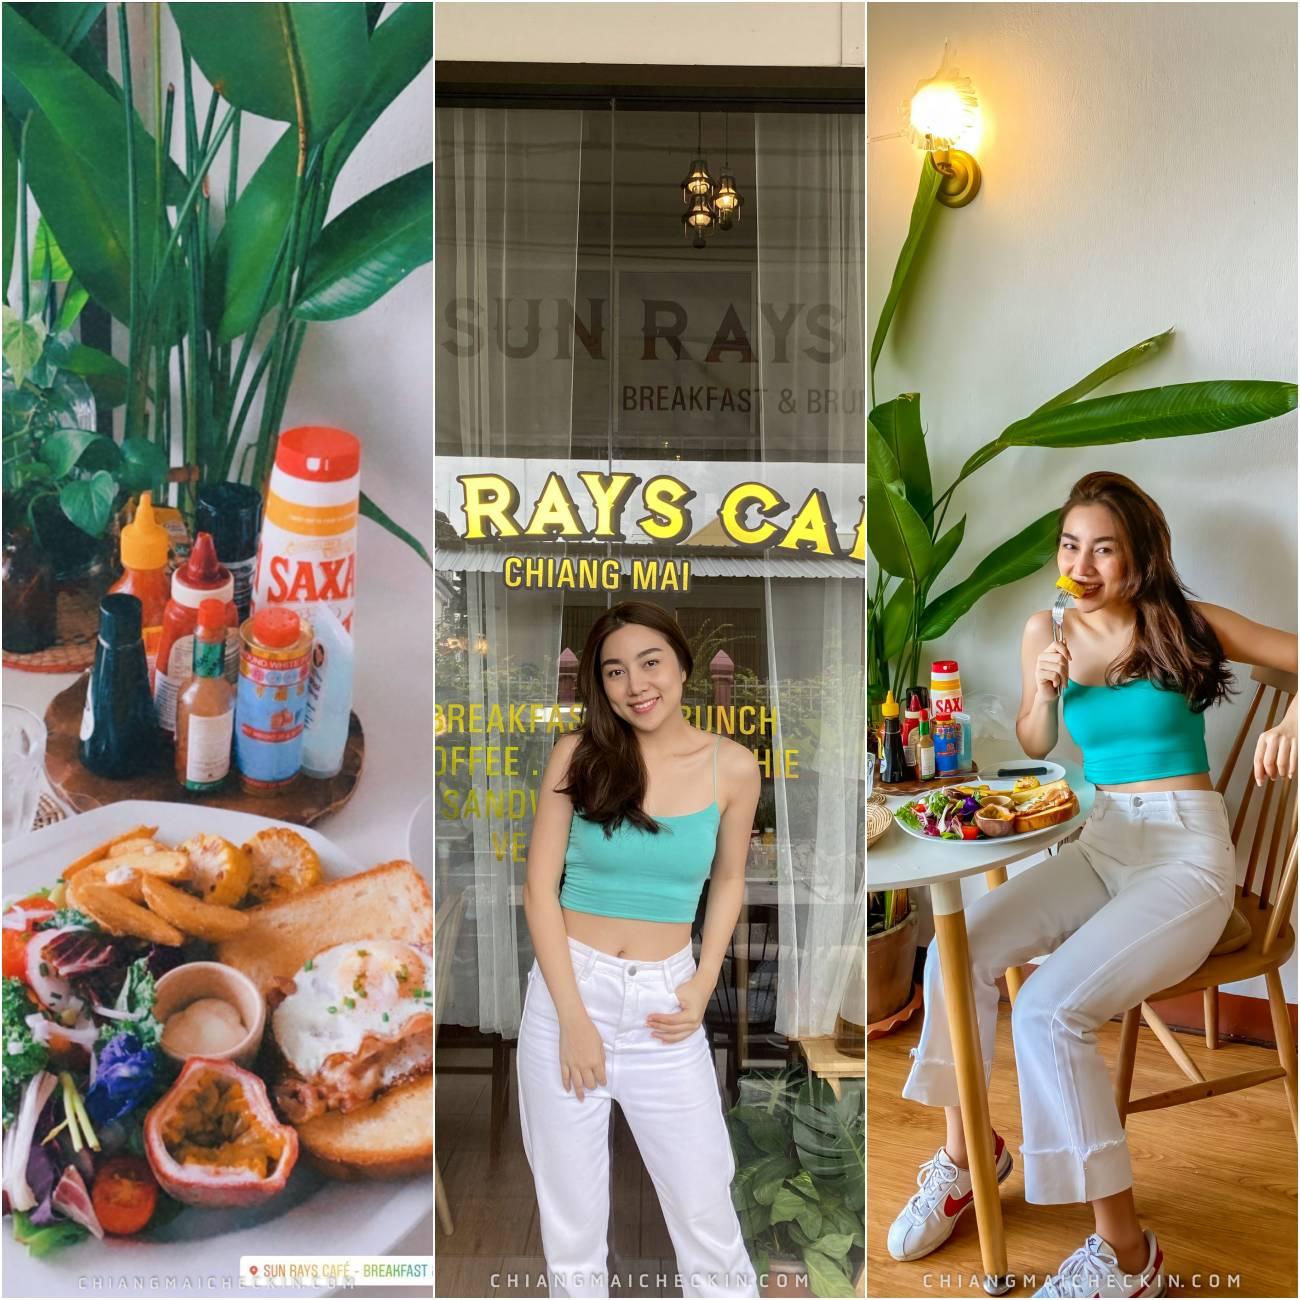 Sun Rays Cafe  ร้านจัดเต็มมาแบบไม่กั๊ก รสชาติอร่อยเวออร์ และยังตกแต่งร้านสวยงามอีกด้วย ส่วนสมู๊ตตี้ก็ไม่หวานเกินไปสายสุขภาพต้องห้ามพลาดด